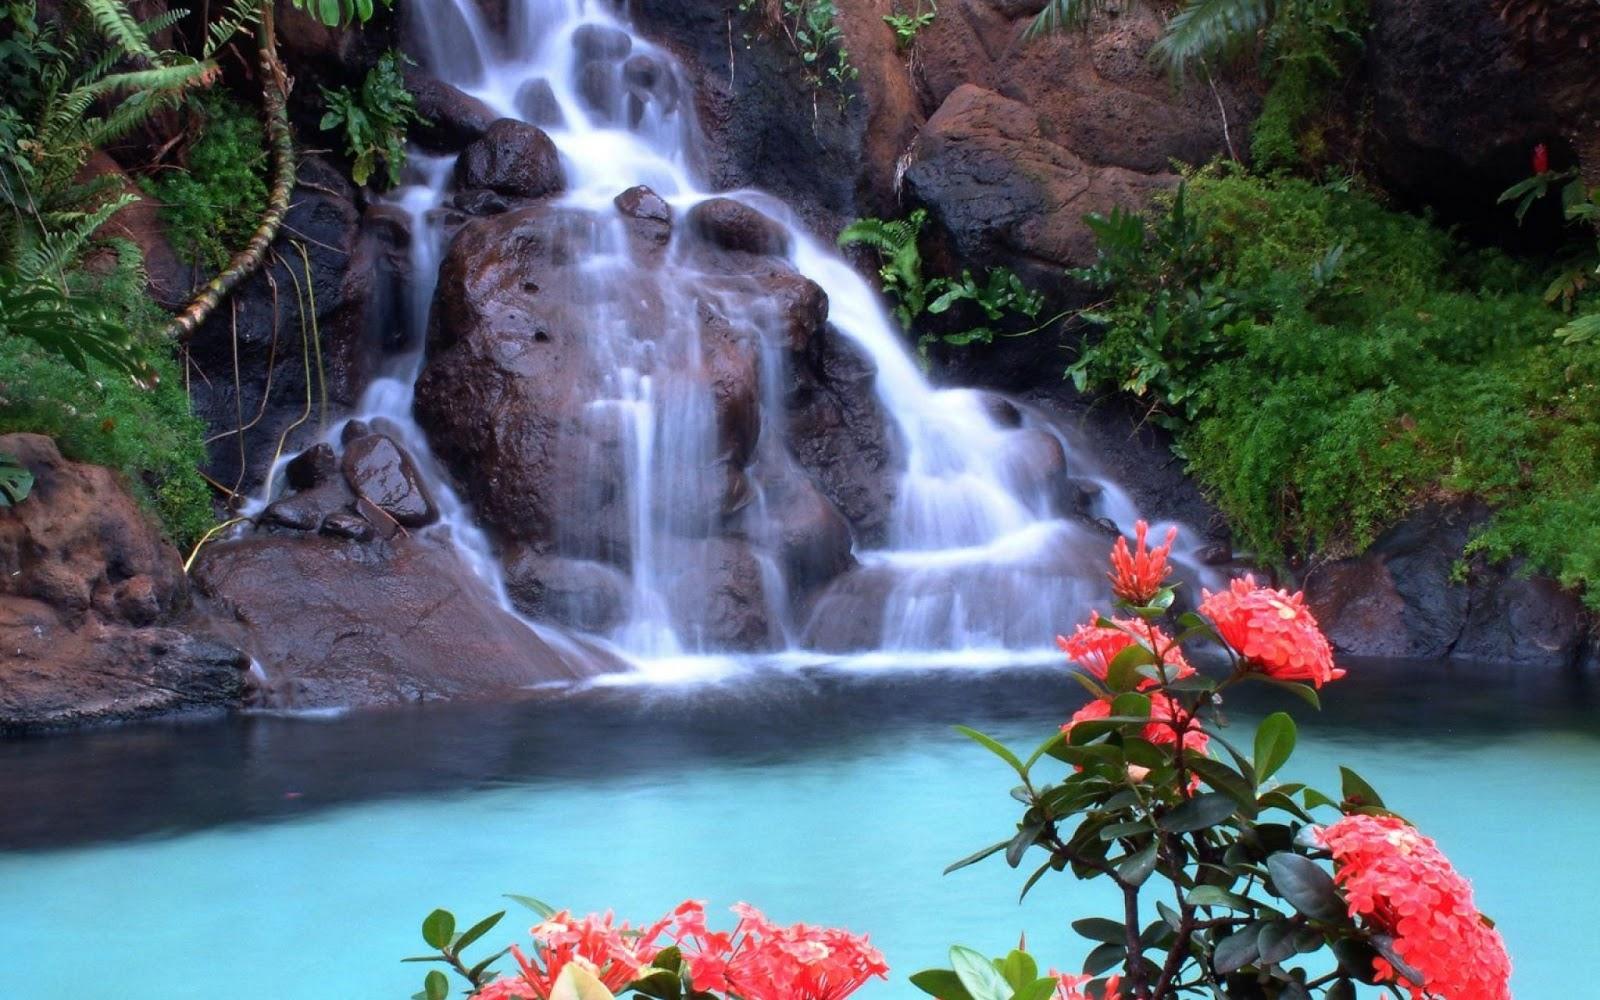 Hd wallpaper jharna - Waterfall Hd Wallpapers